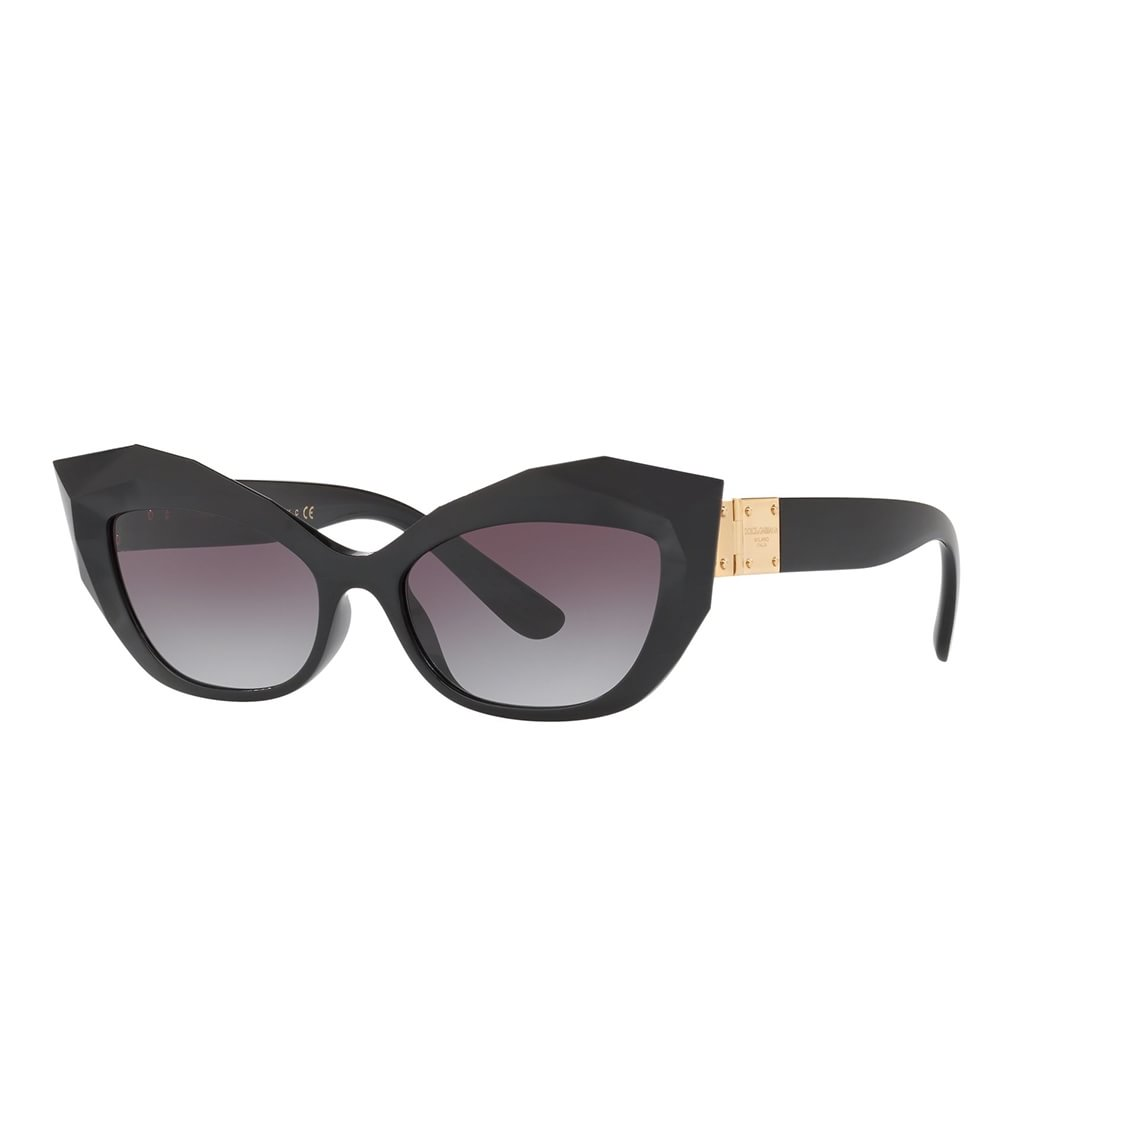 Dolce & Gabbana 0DG6123 54 501/8G